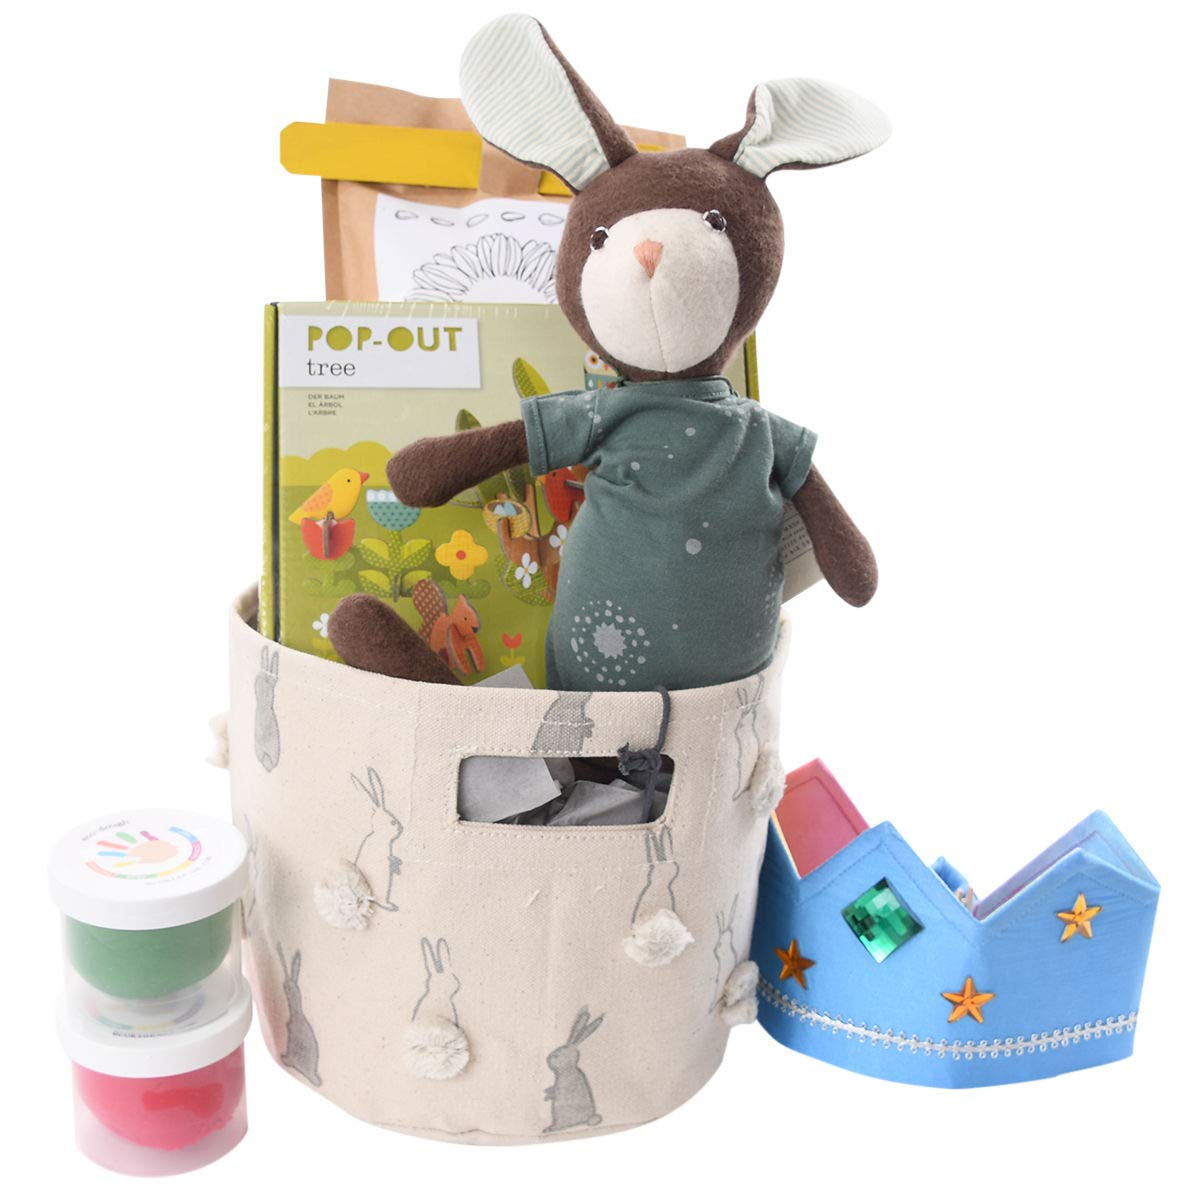 Children's Birthday - Easter Gift Basket for Boys - Eco-Friendly, Organic